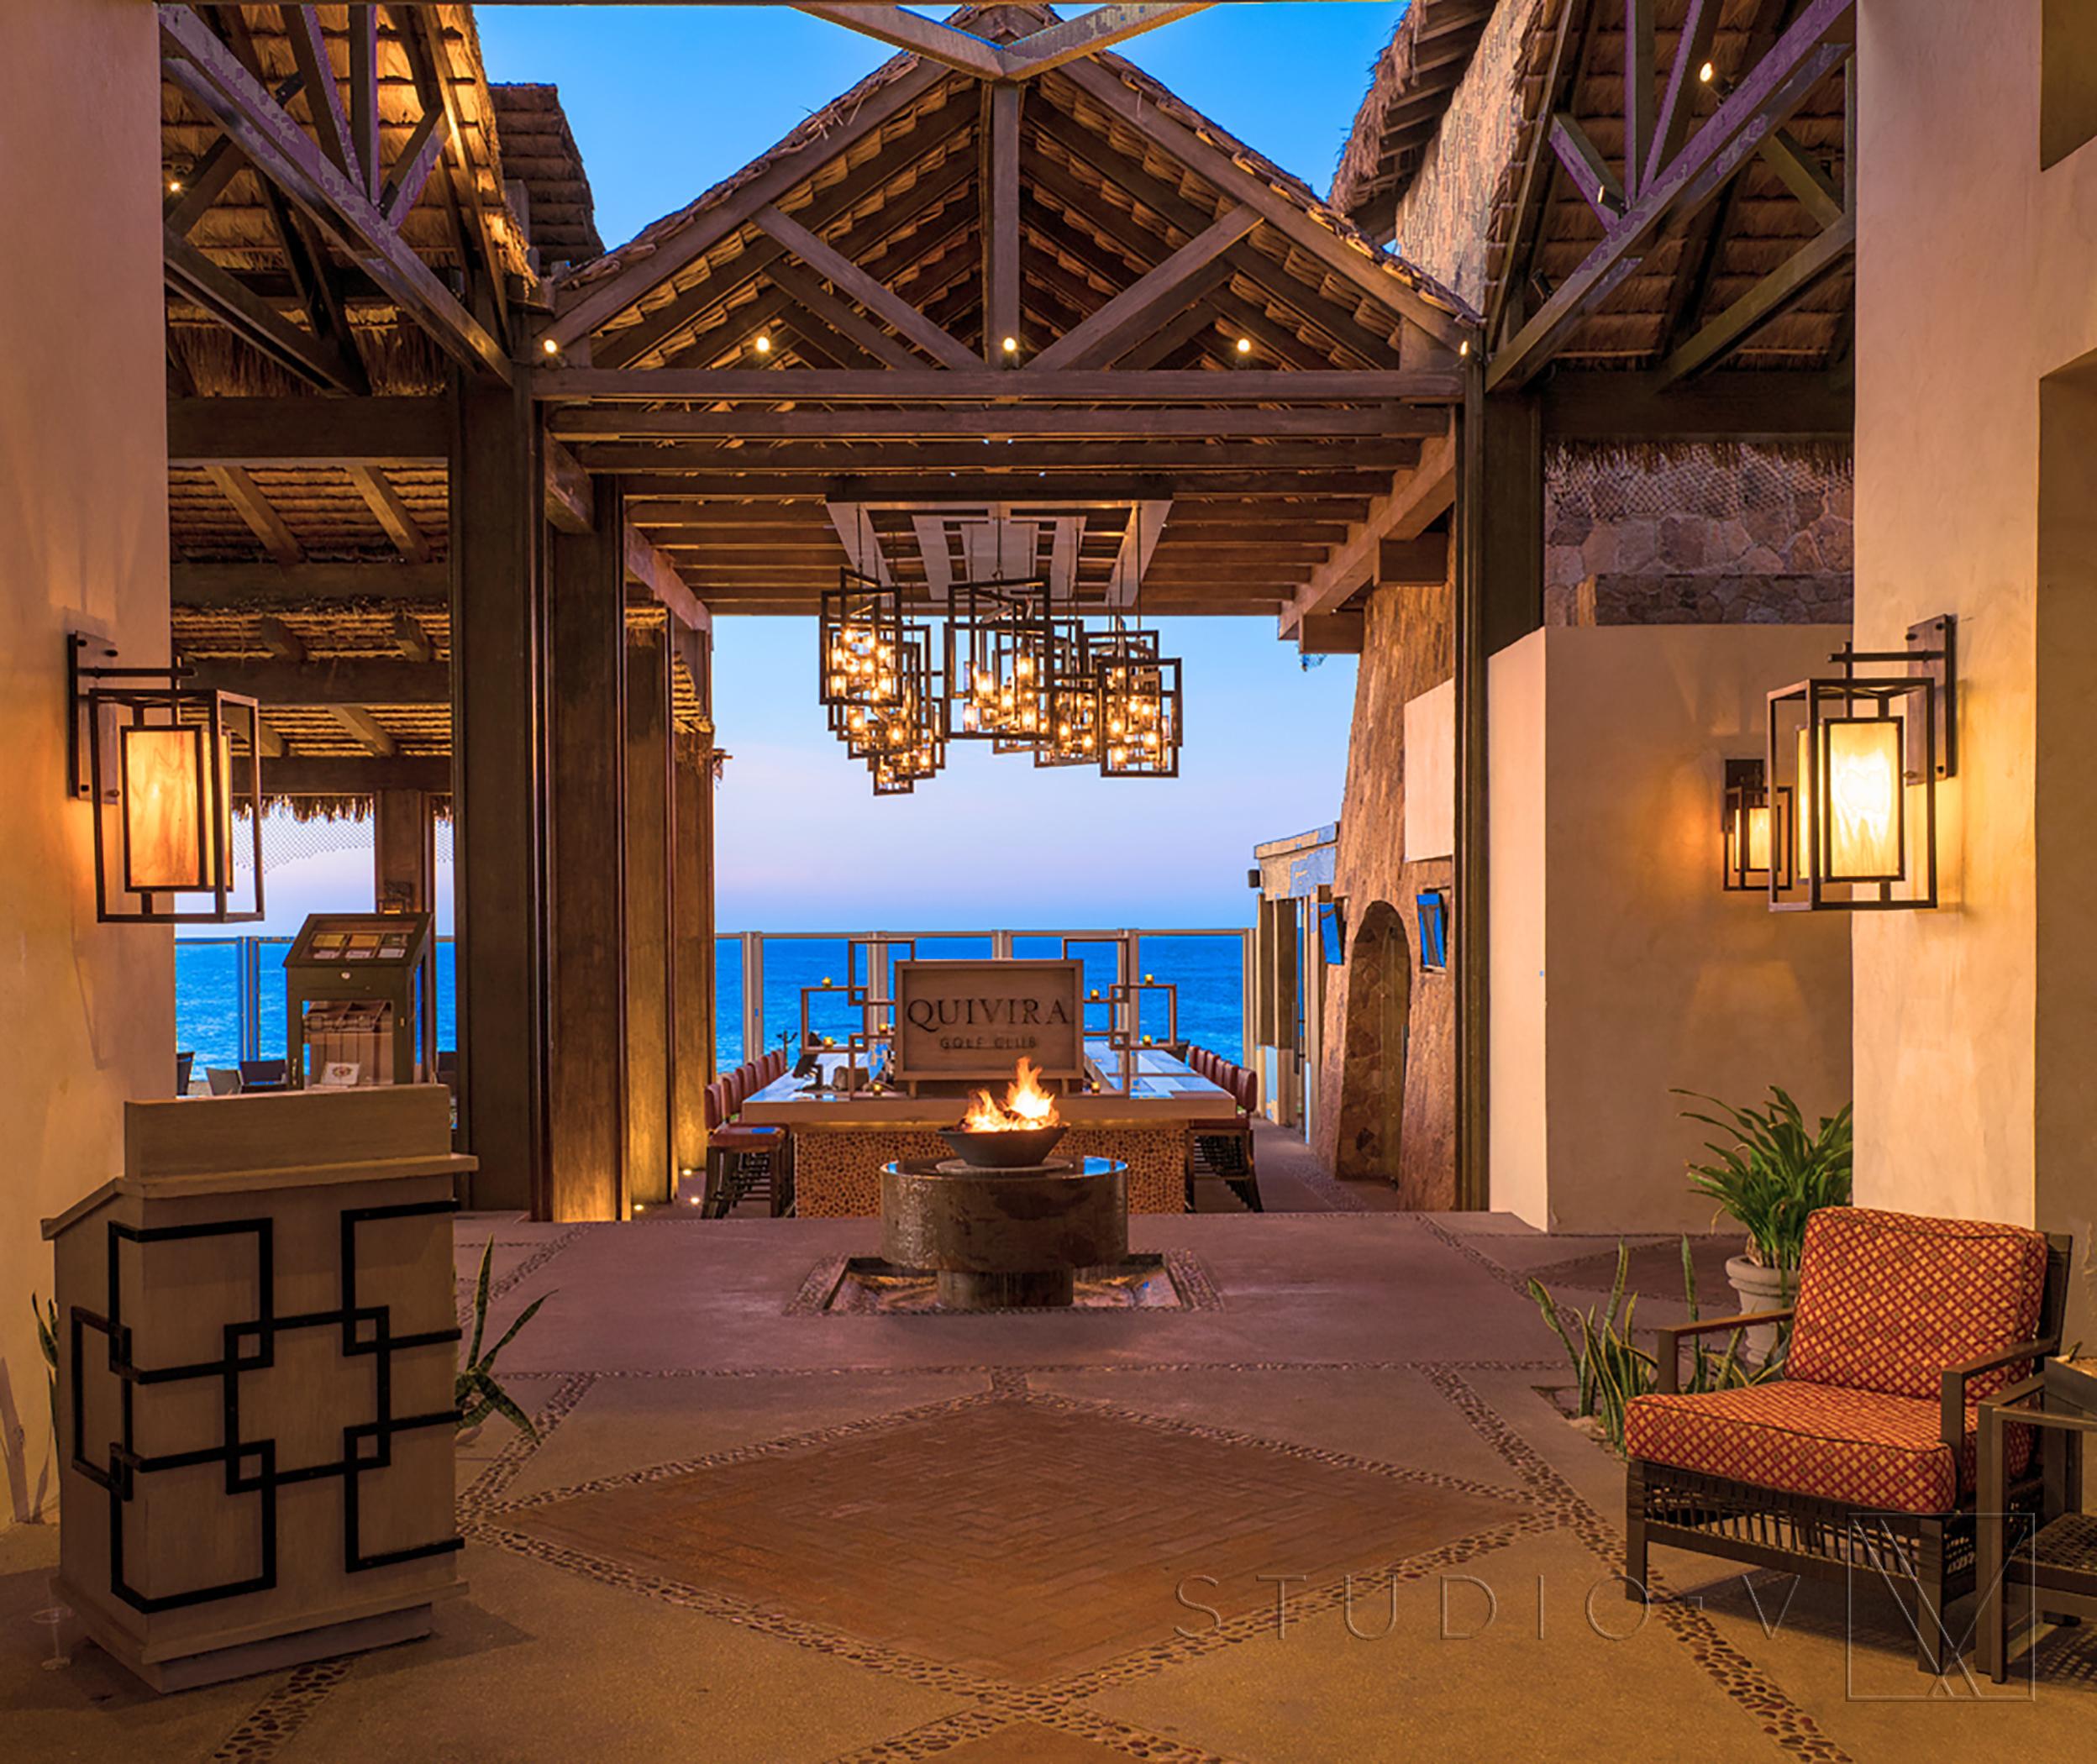 Quivira Clubhouse Sunset Beach Cabo San Lucas Studio V Interior Architecture and Design Scottsdale Arizona AZ (13).jpg